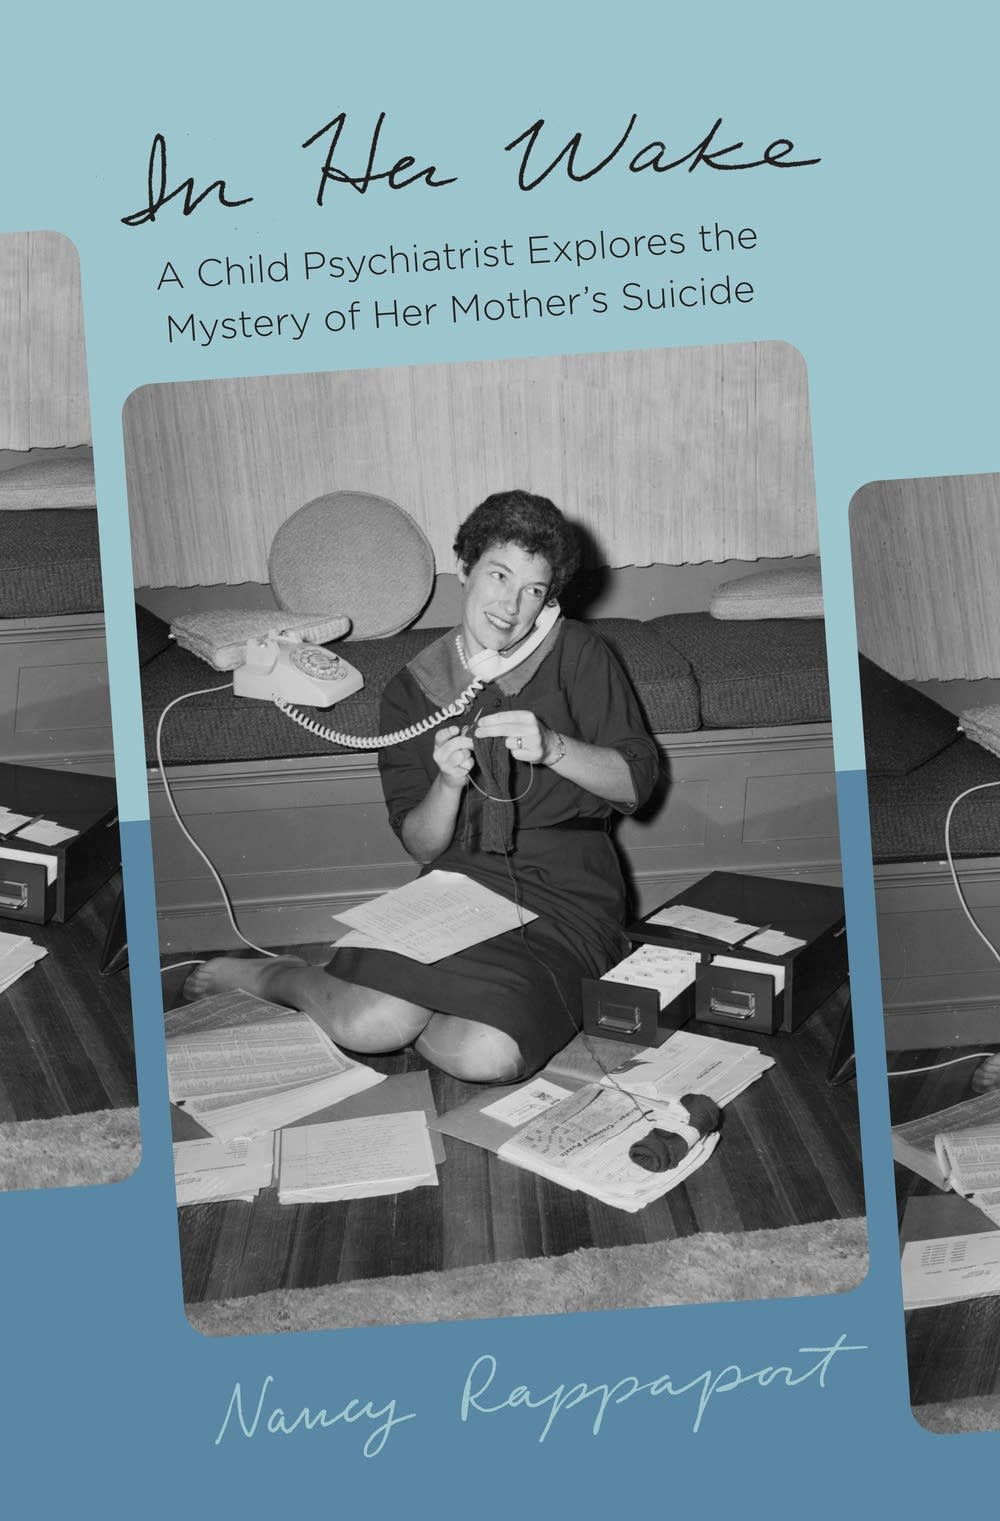 Nancy Rappaport's novel